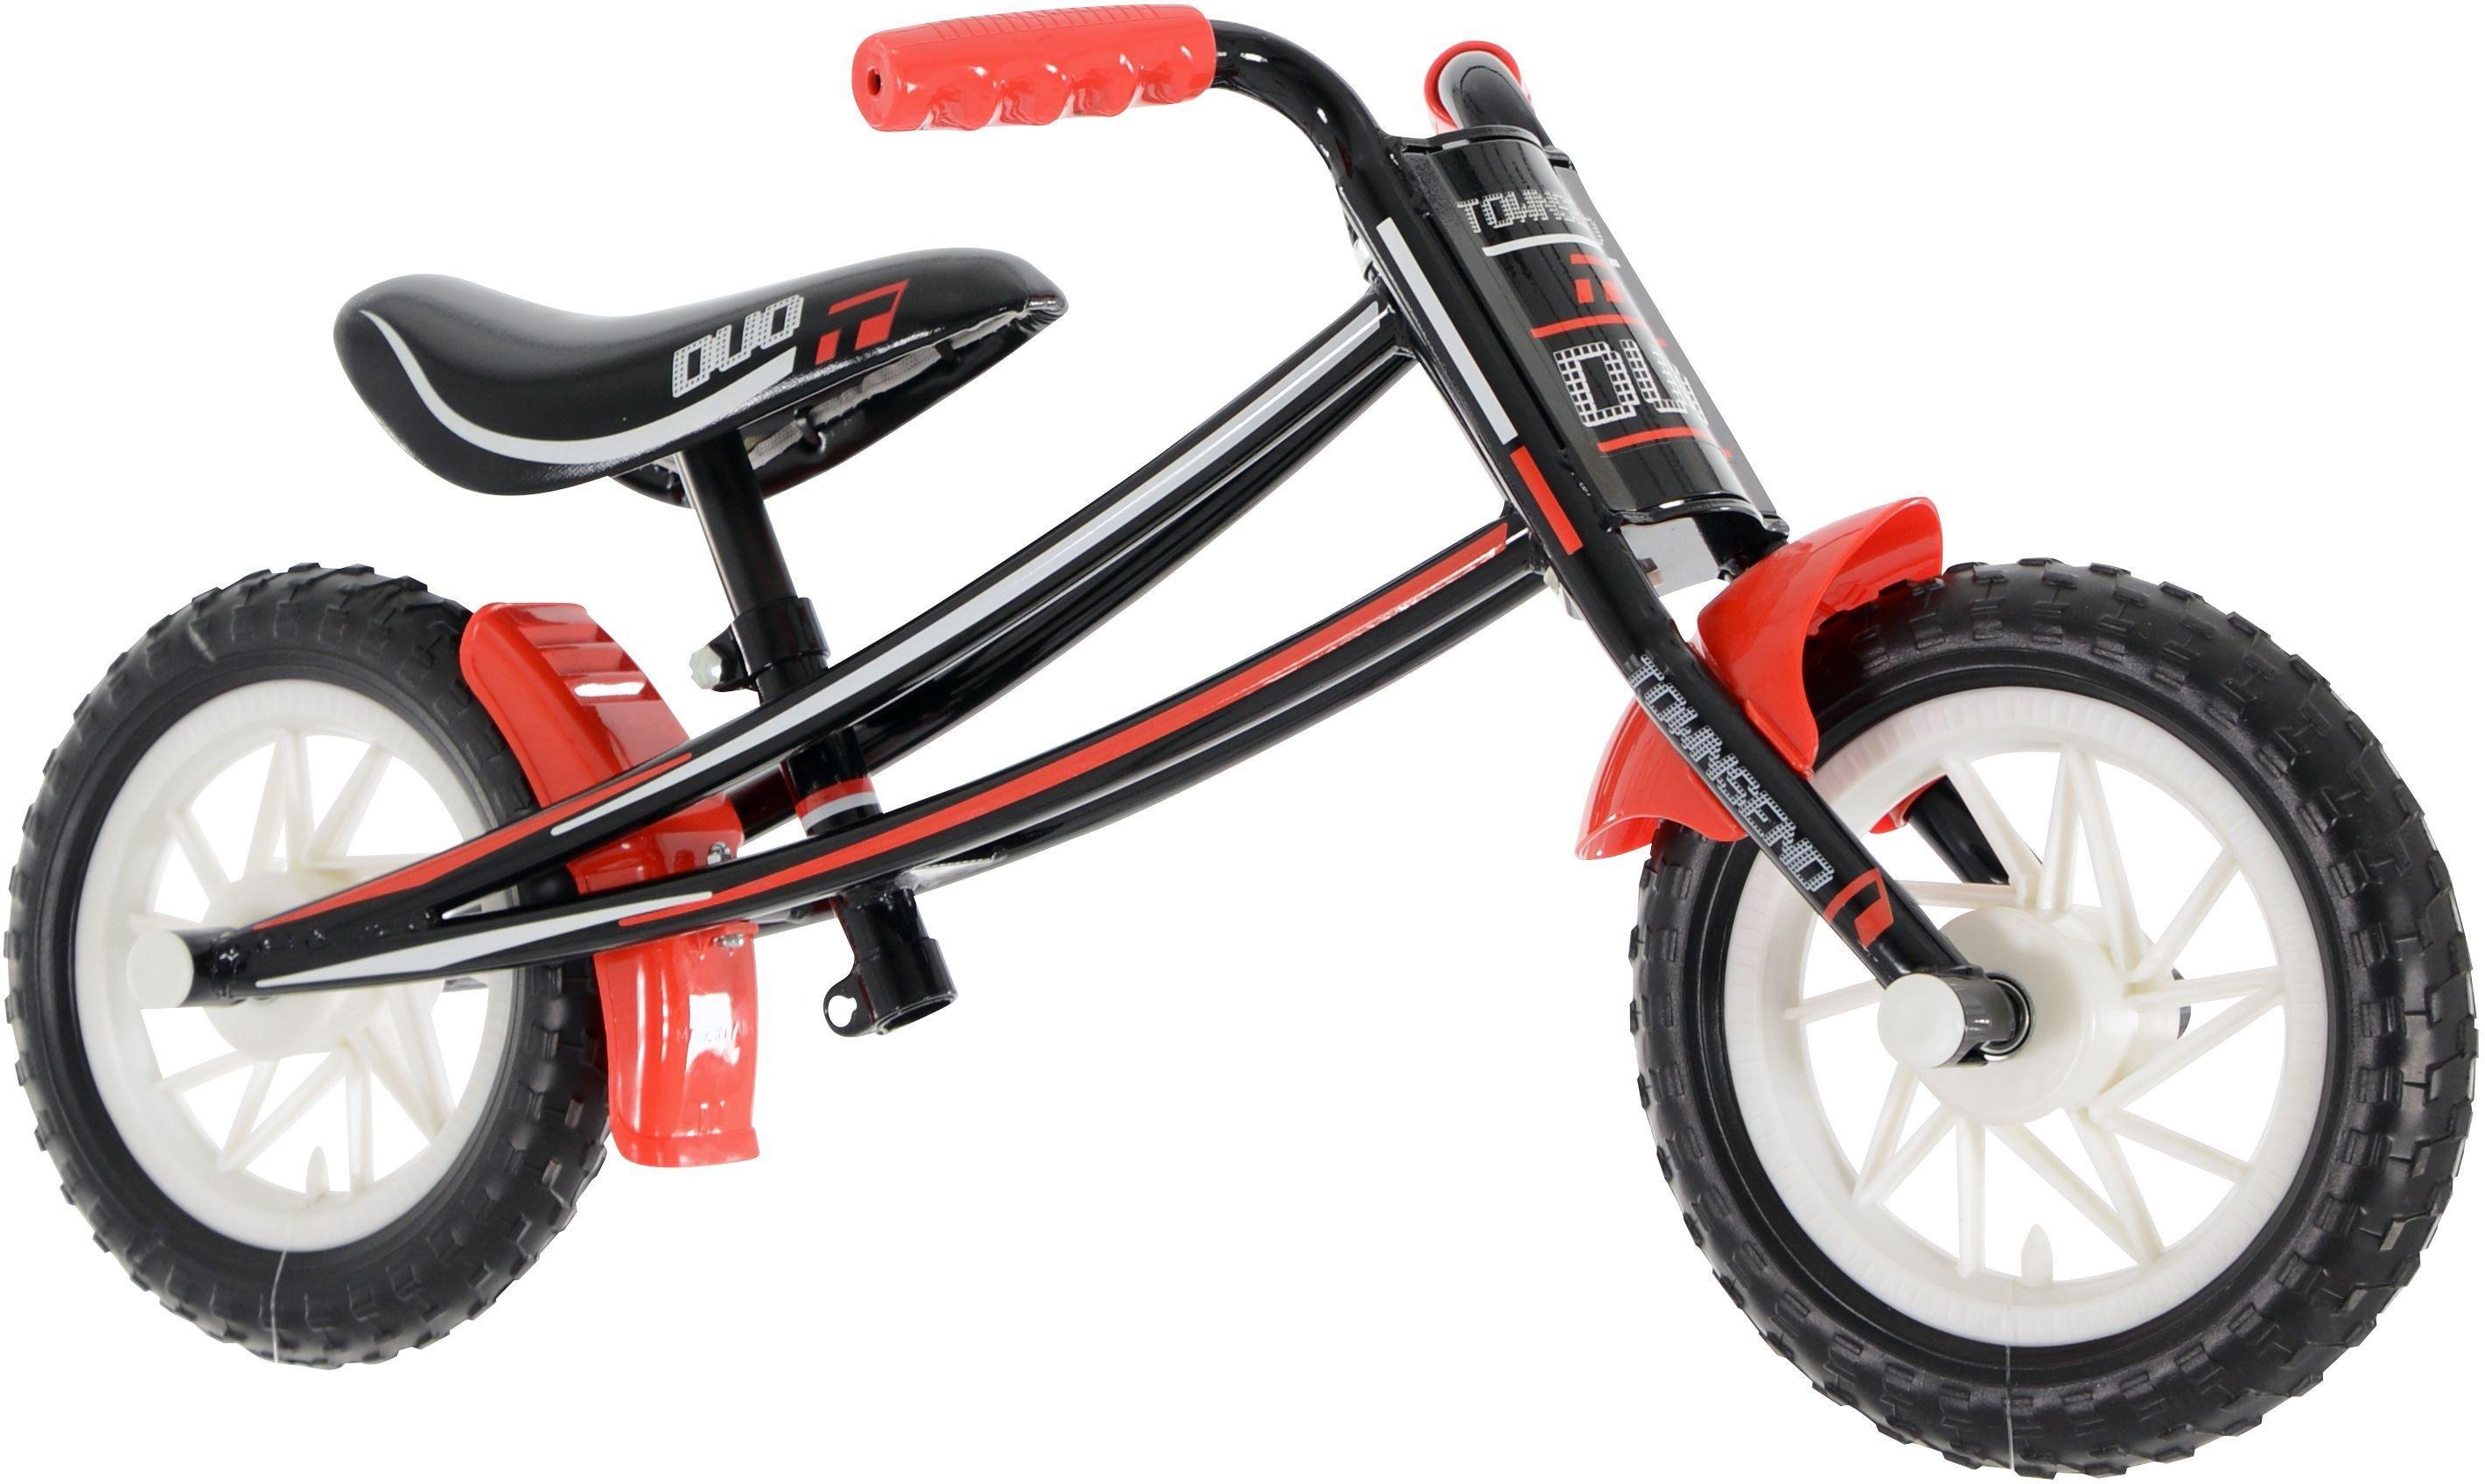 Townsend Duo Red 10 inch Wheel Size Kids Balance Bike